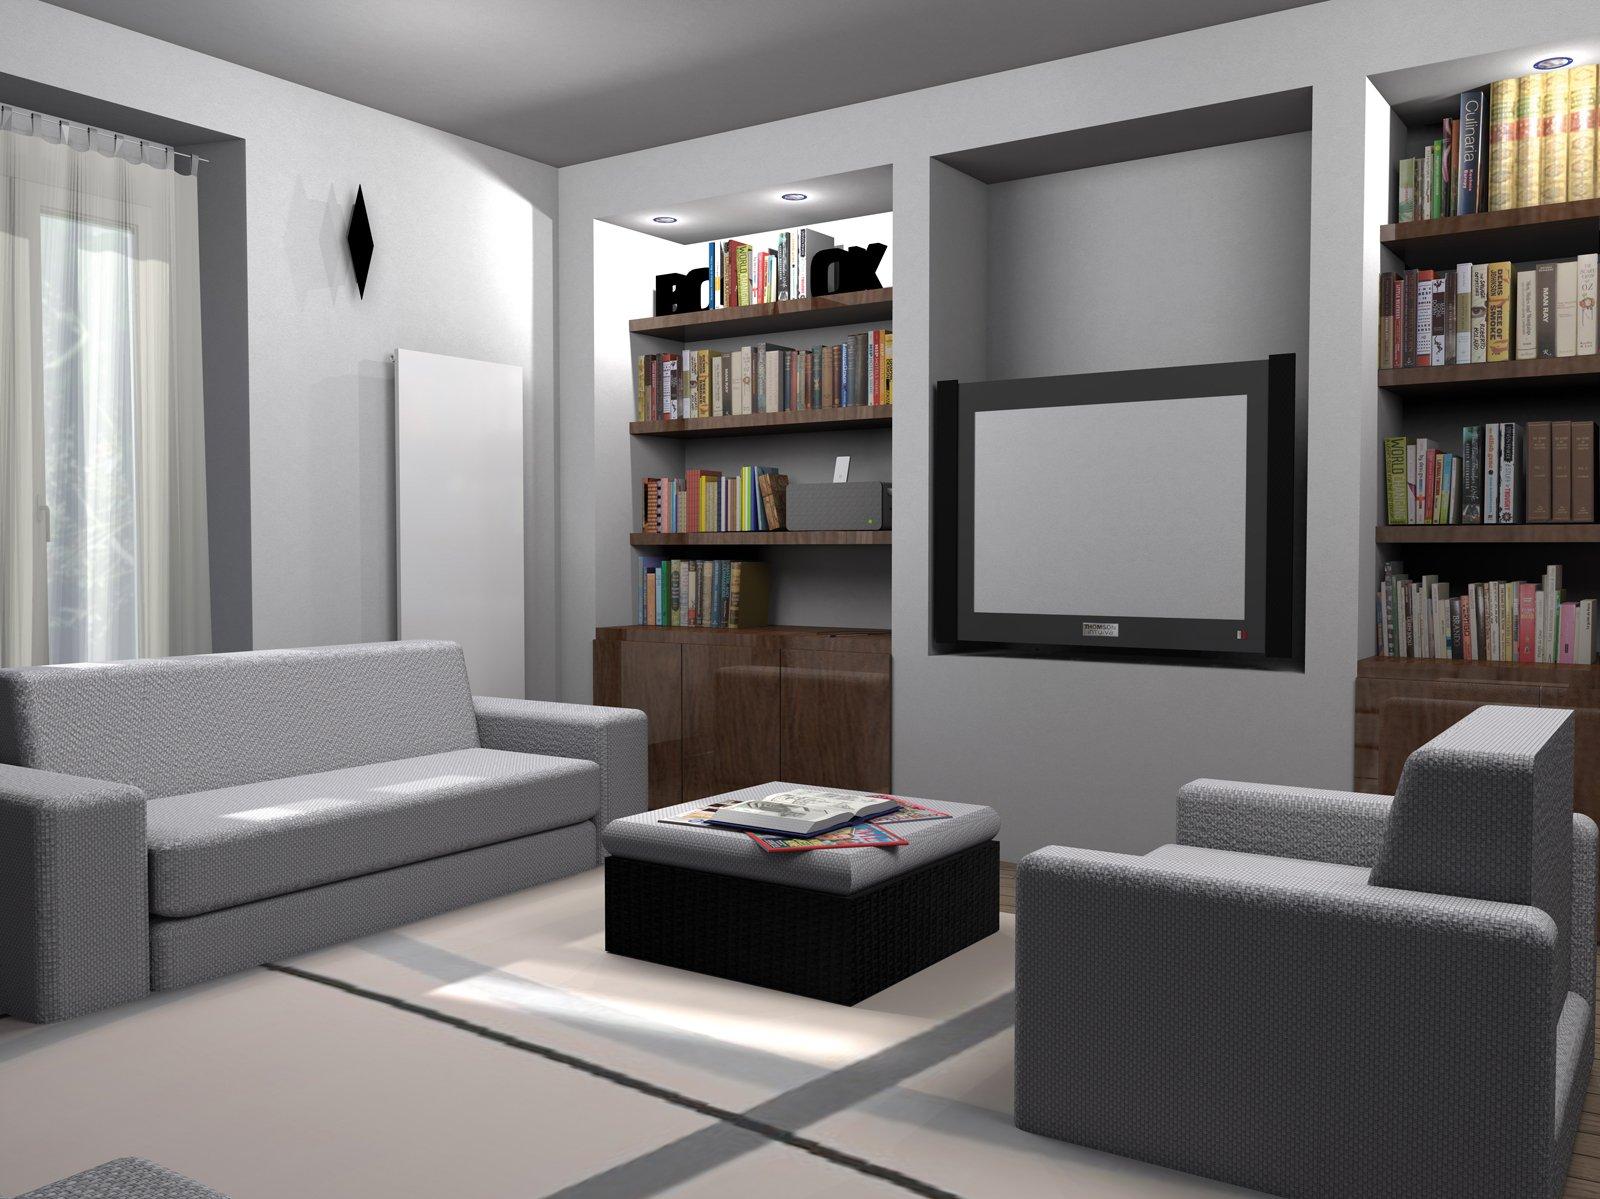 La parete libreria in cartongesso cose di casa - Casa in cartongesso ...